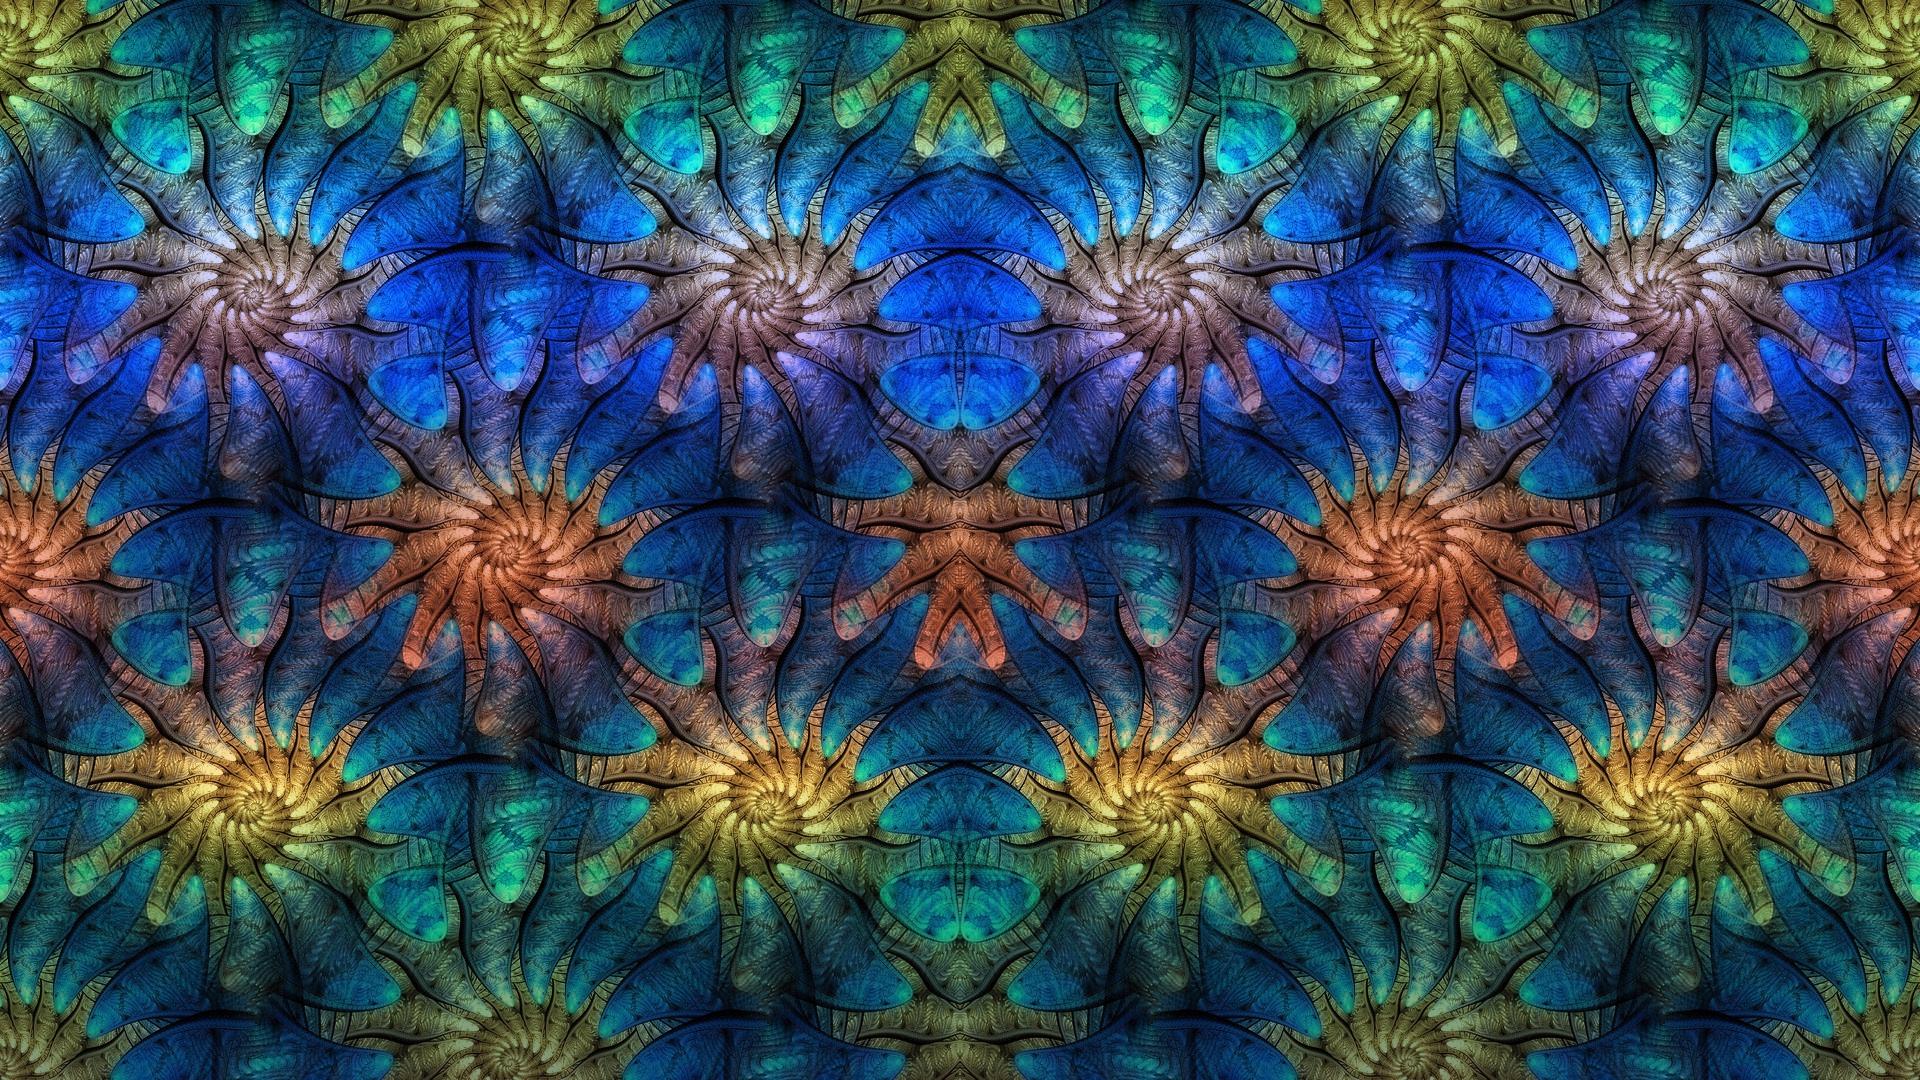 Artistic Colors Digital Art Fractal Pattern 1920x1080